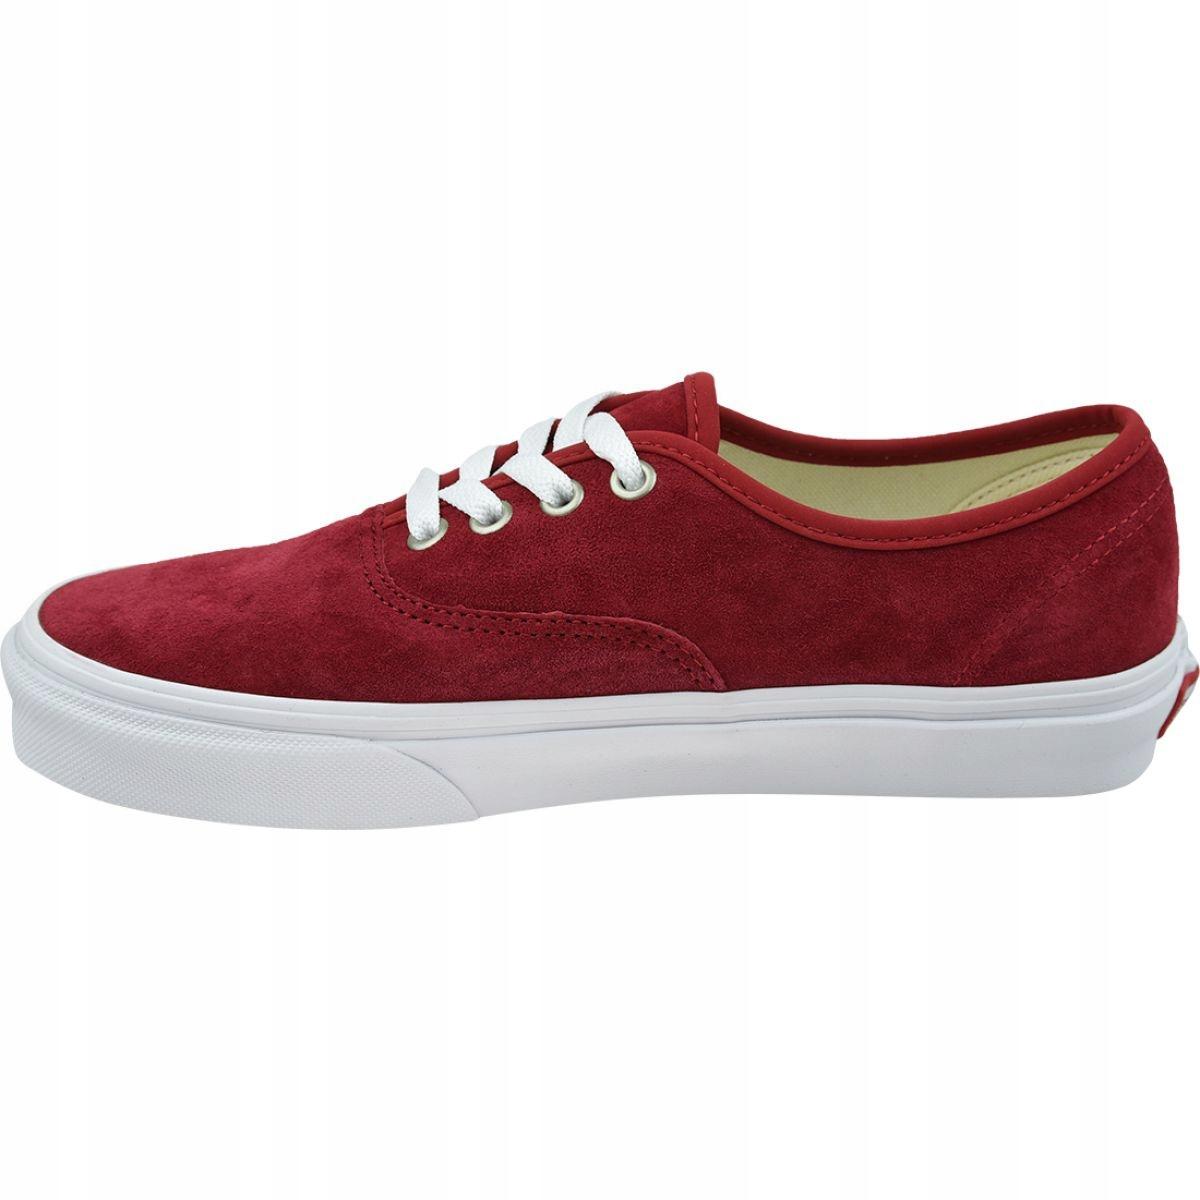 Sapatilhas Vans Authentic W VN0A38EMU5M1 vermelho